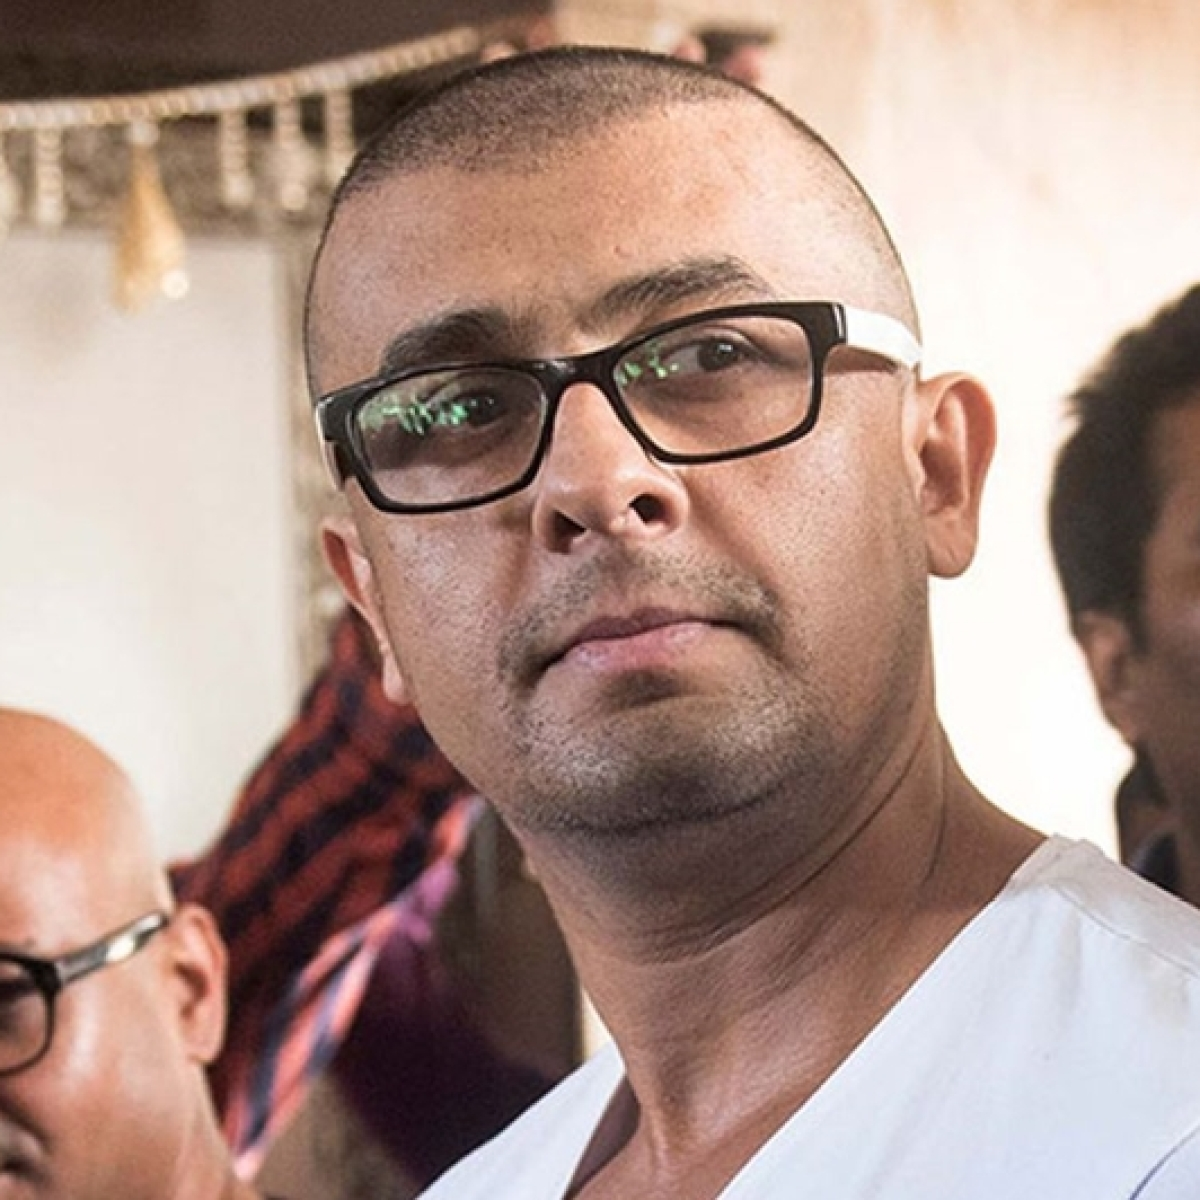 Stuck in Dubai, Sonu Nigam faces backlash over old Azaan tweet